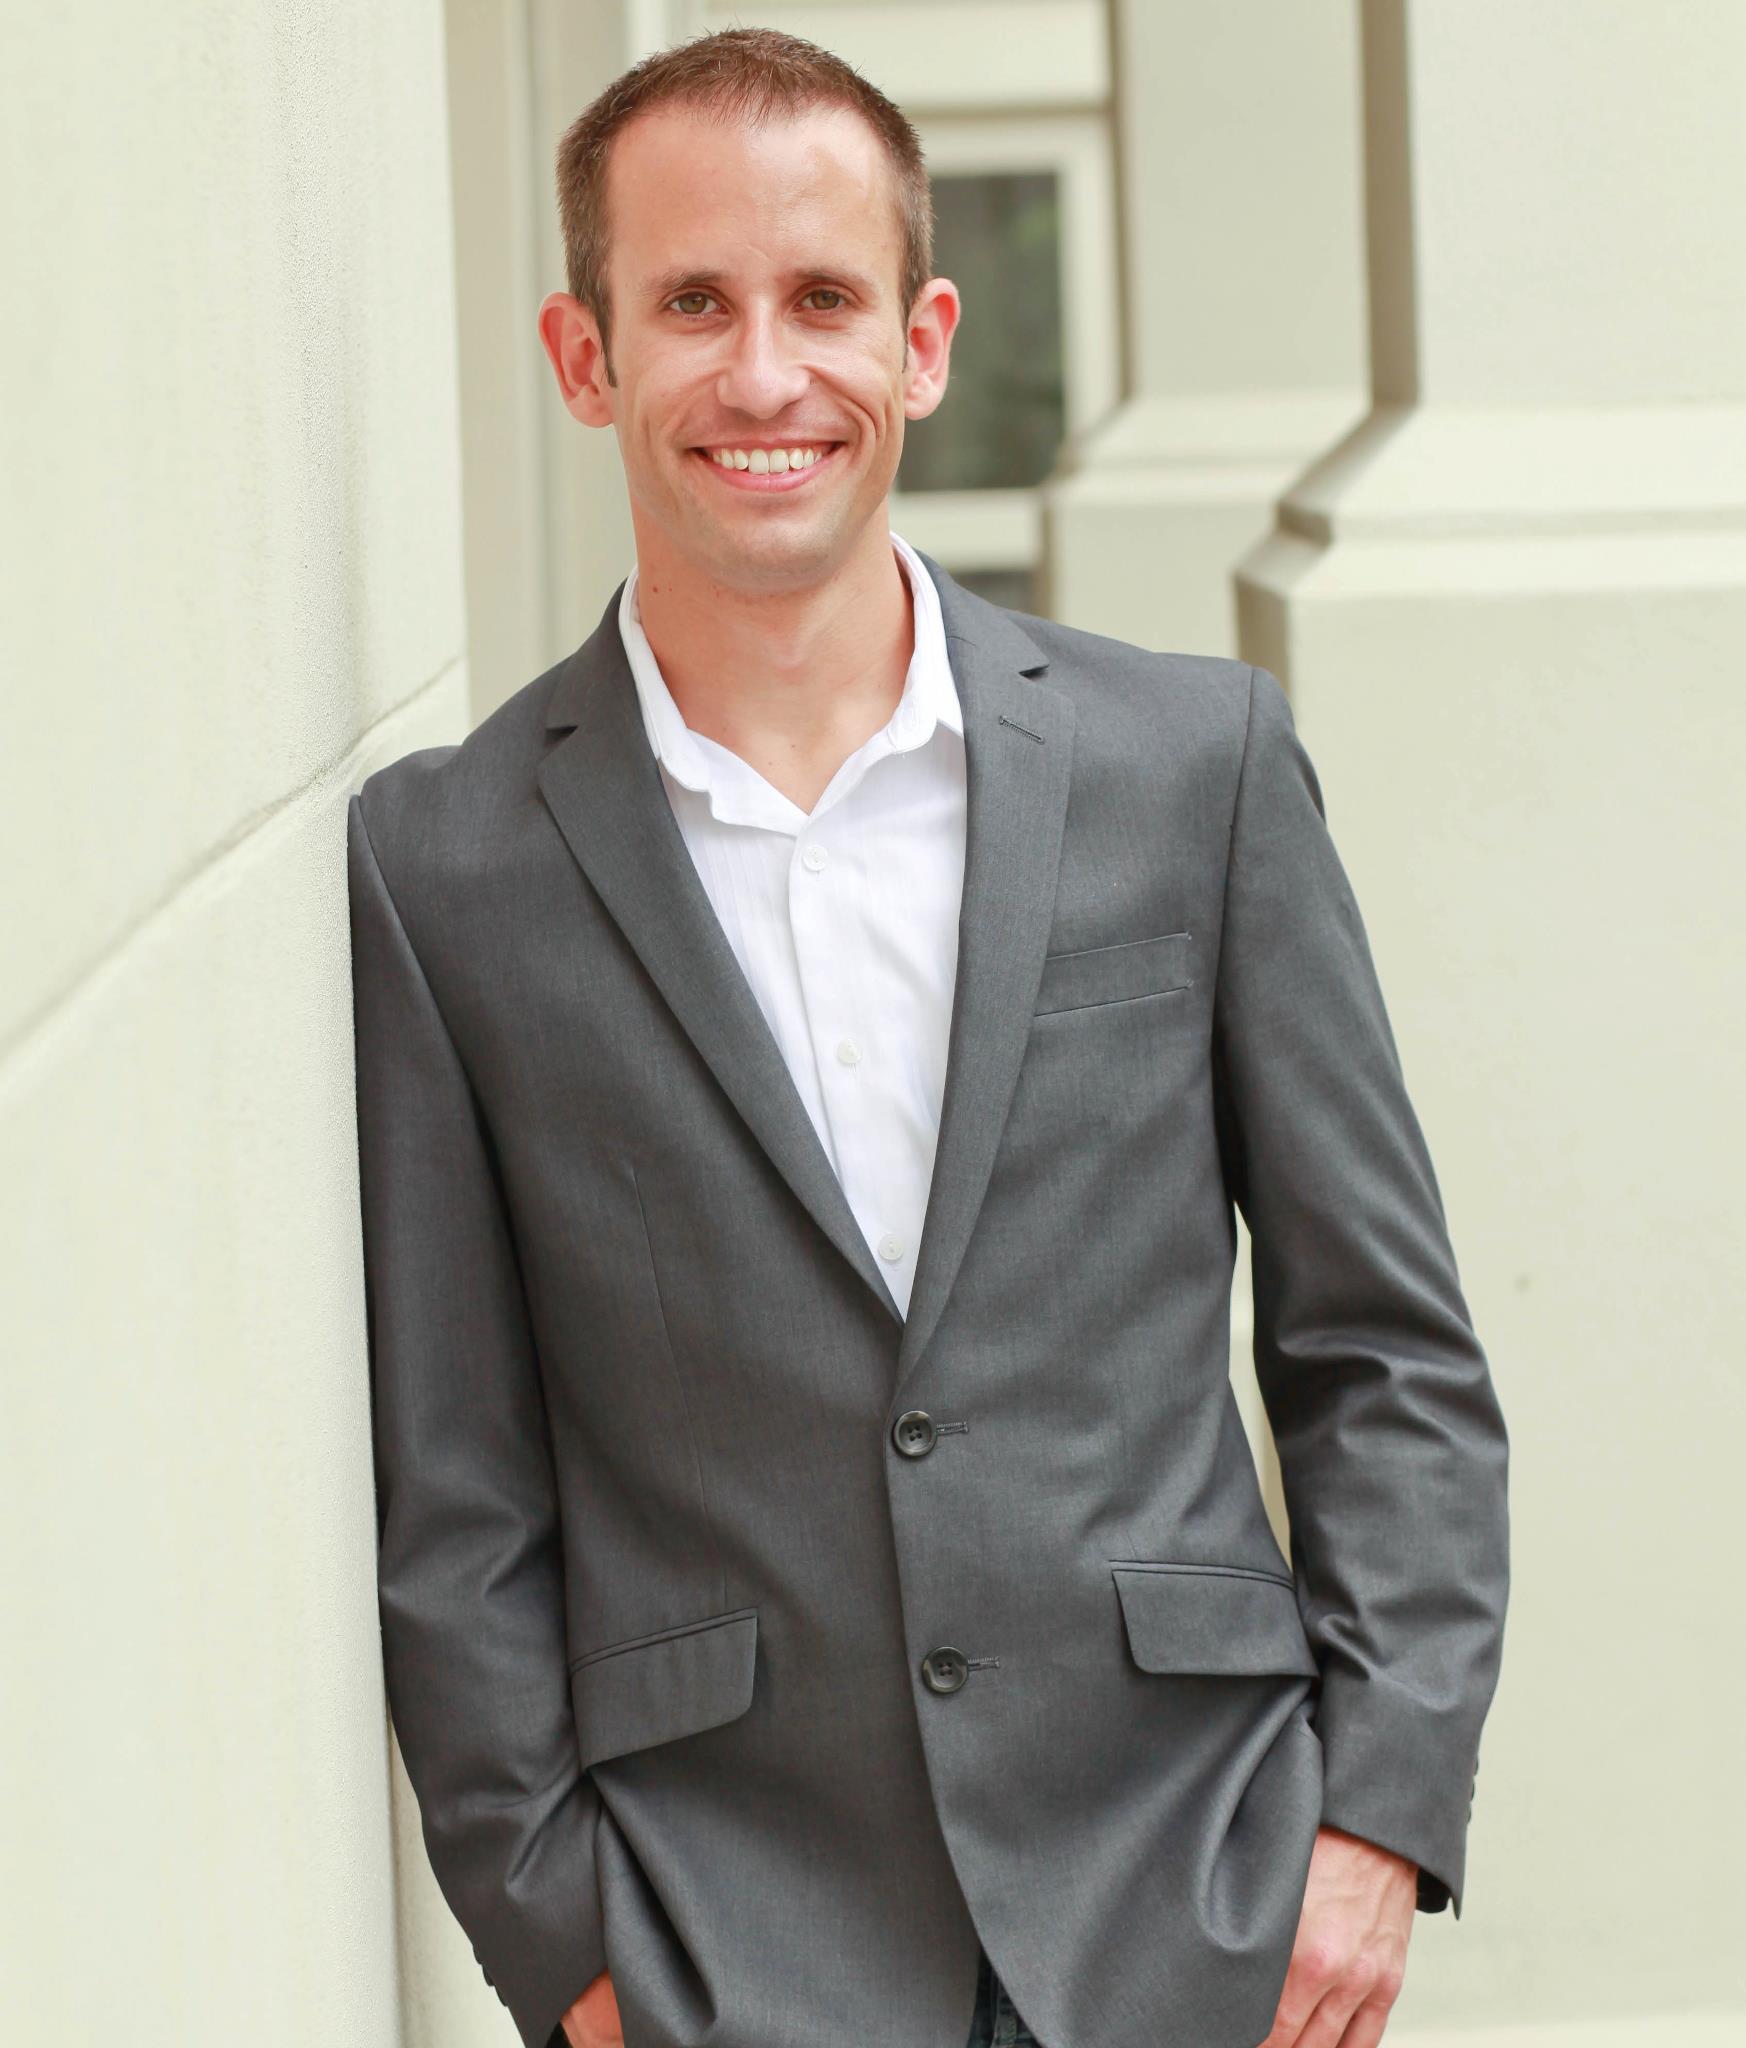 Zachary Spitzer